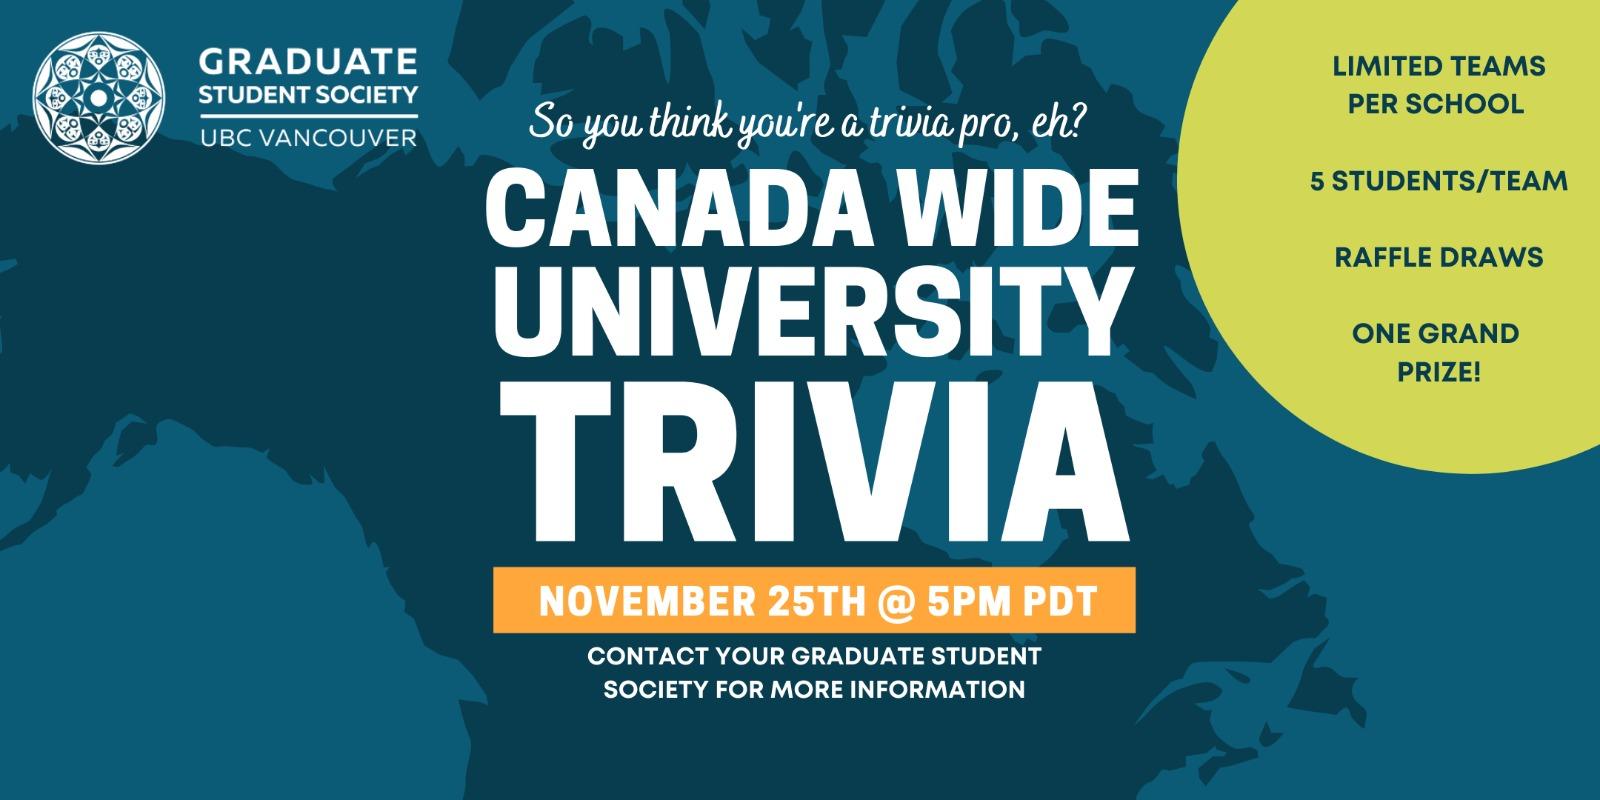 Canada wide trivia